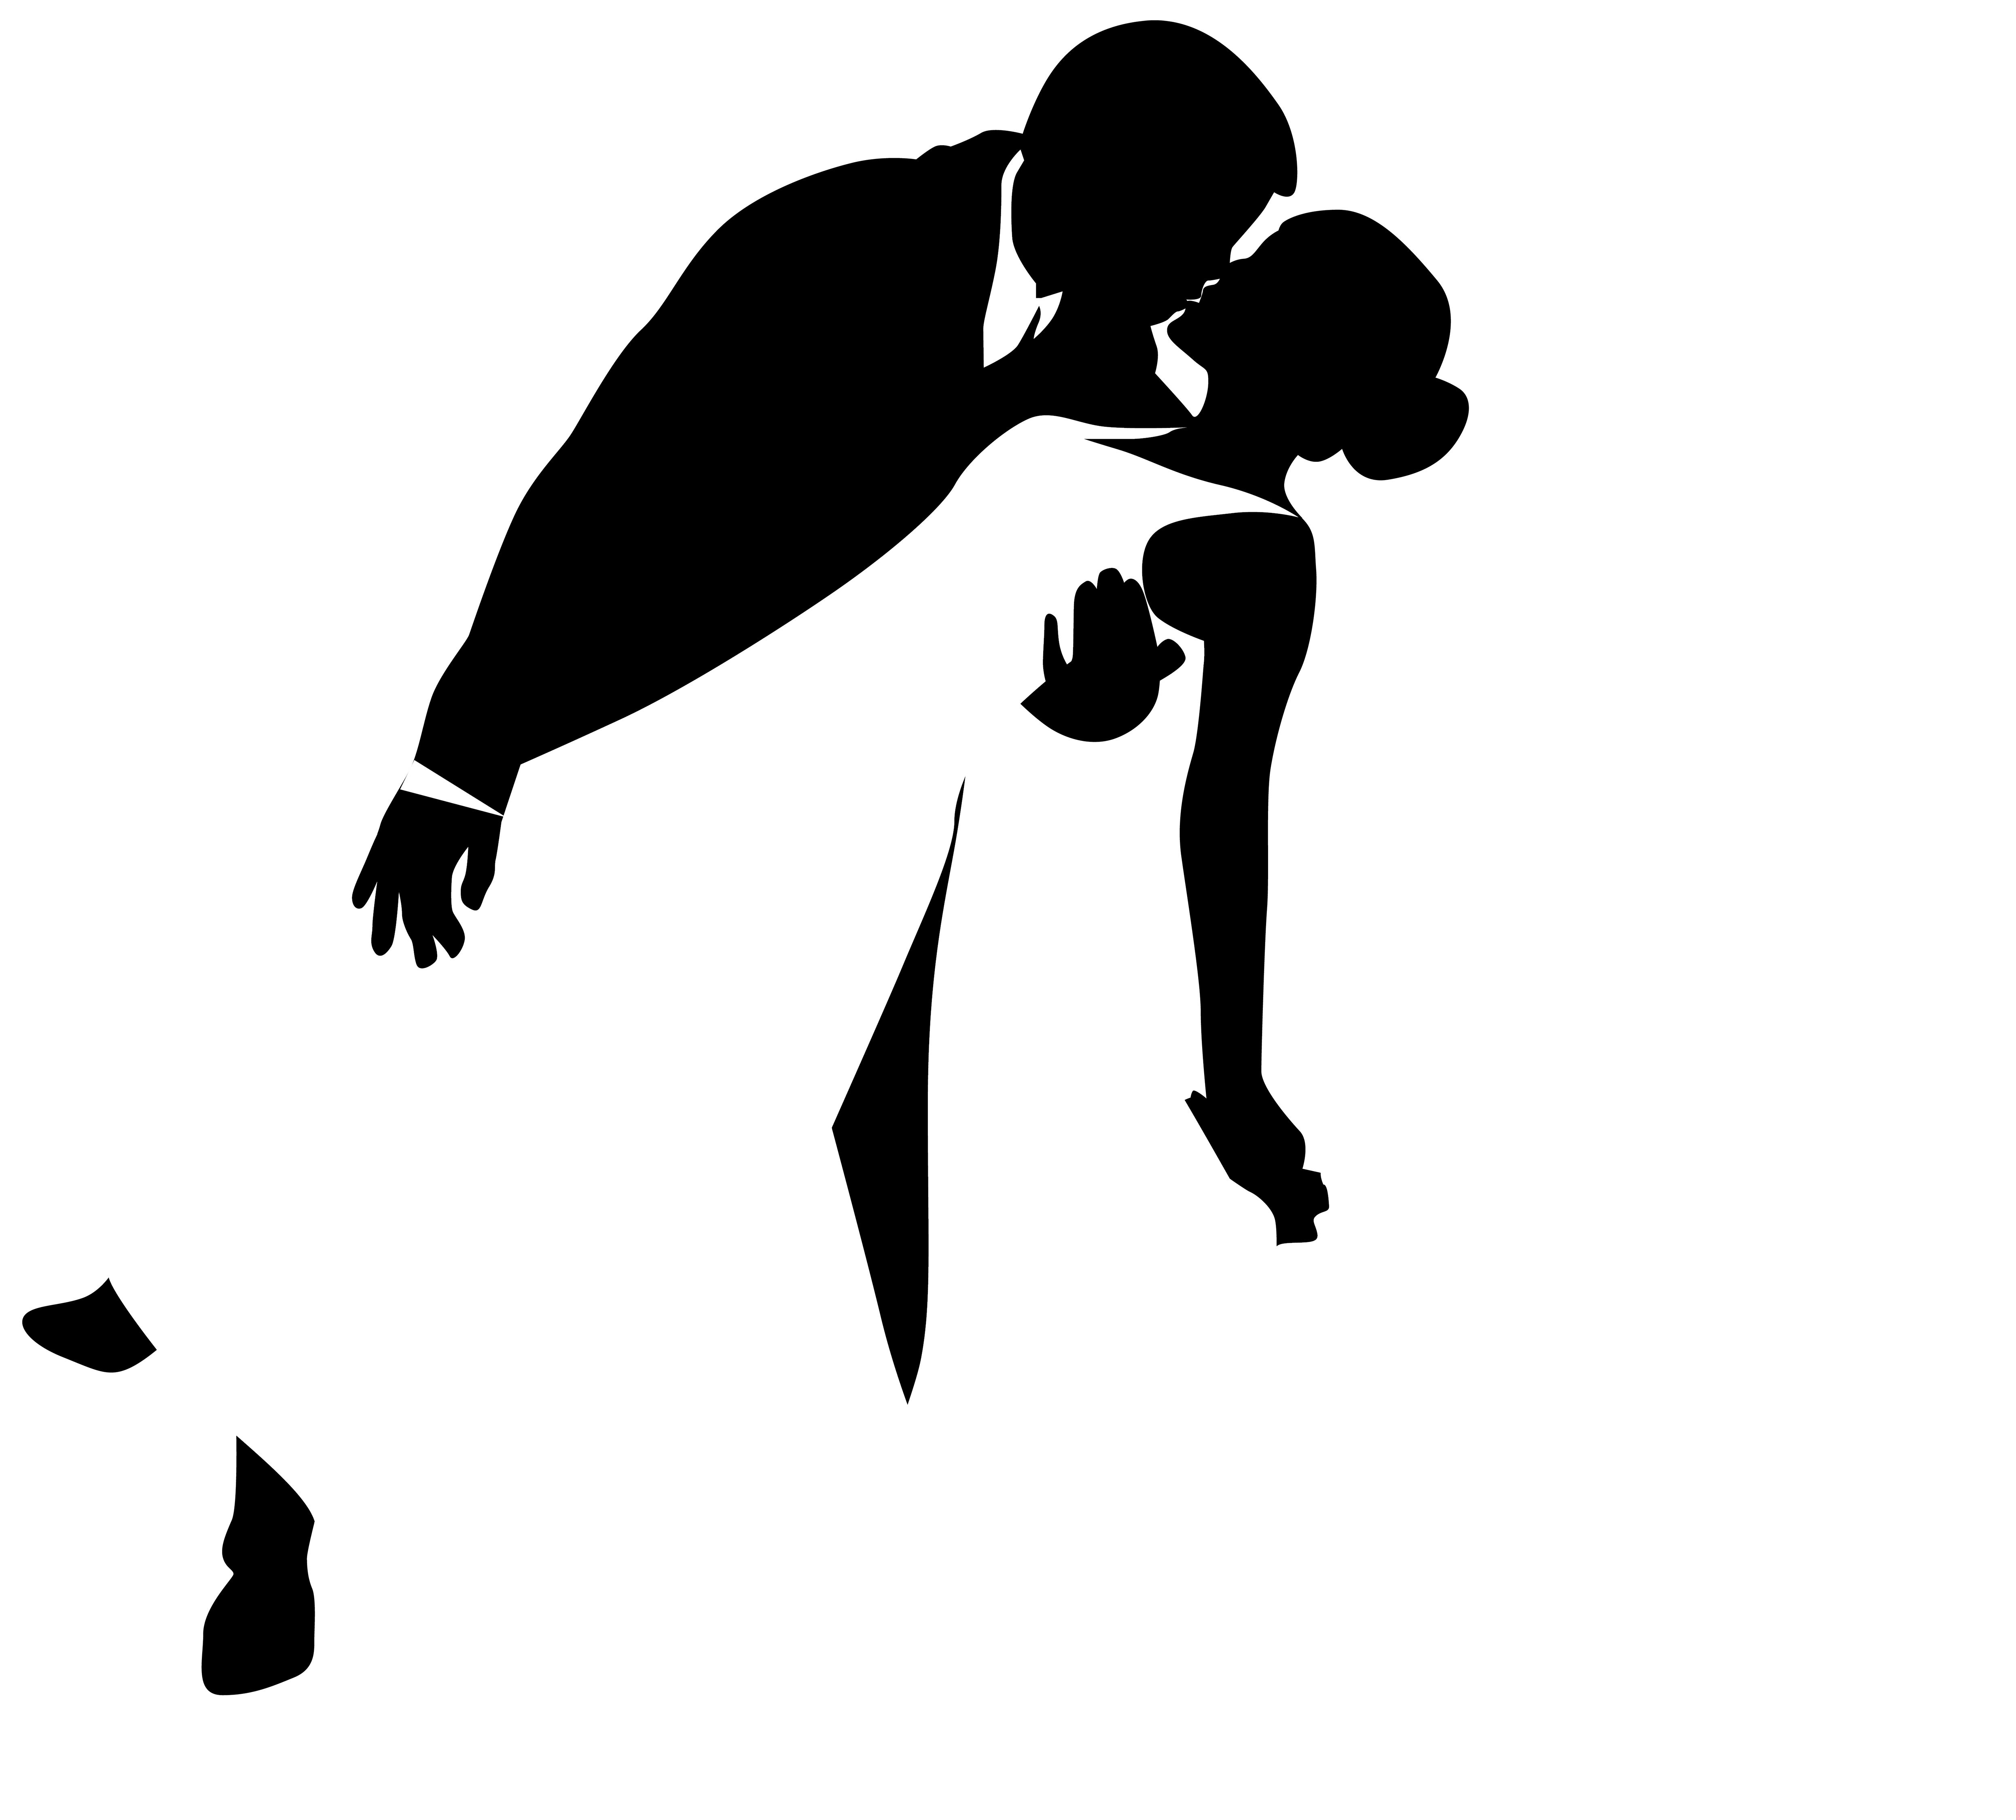 bride and groom silhouette free clip art at getdrawings com free rh getdrawings com wedding clipart free download wedding clipart free images